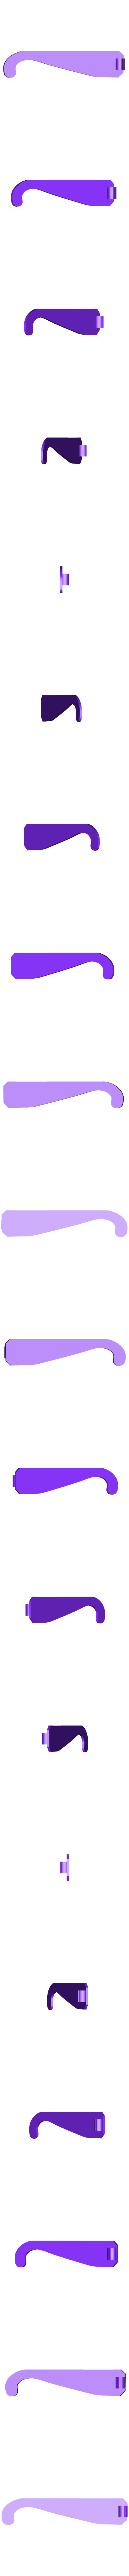 luna_lovegood_glasses_left_ear.stl Download free STL file Luna Lovegood SpectreSpecs • 3D printer template, mark579